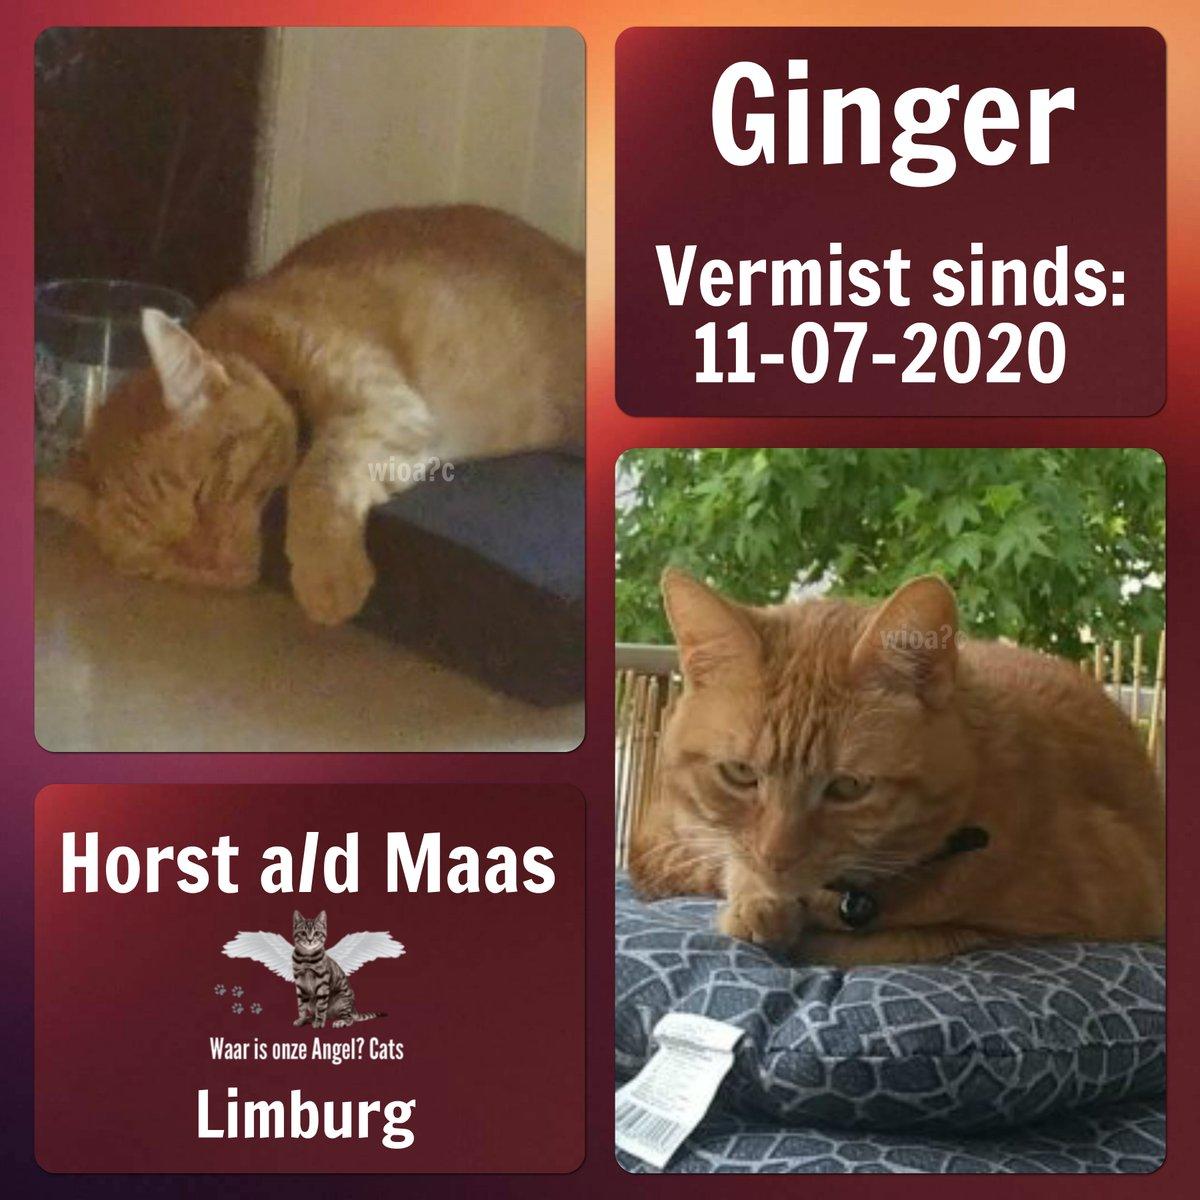 Ginger #Vermist sinds 11-07-2020 te #HorstadMaas #Limburg #Nederland   https://www.facebook.com/380079362362937/photos/rpp.380079362362937/1158910644479801/?type=3&theater…pic.twitter.com/UIhQ0sTAPc